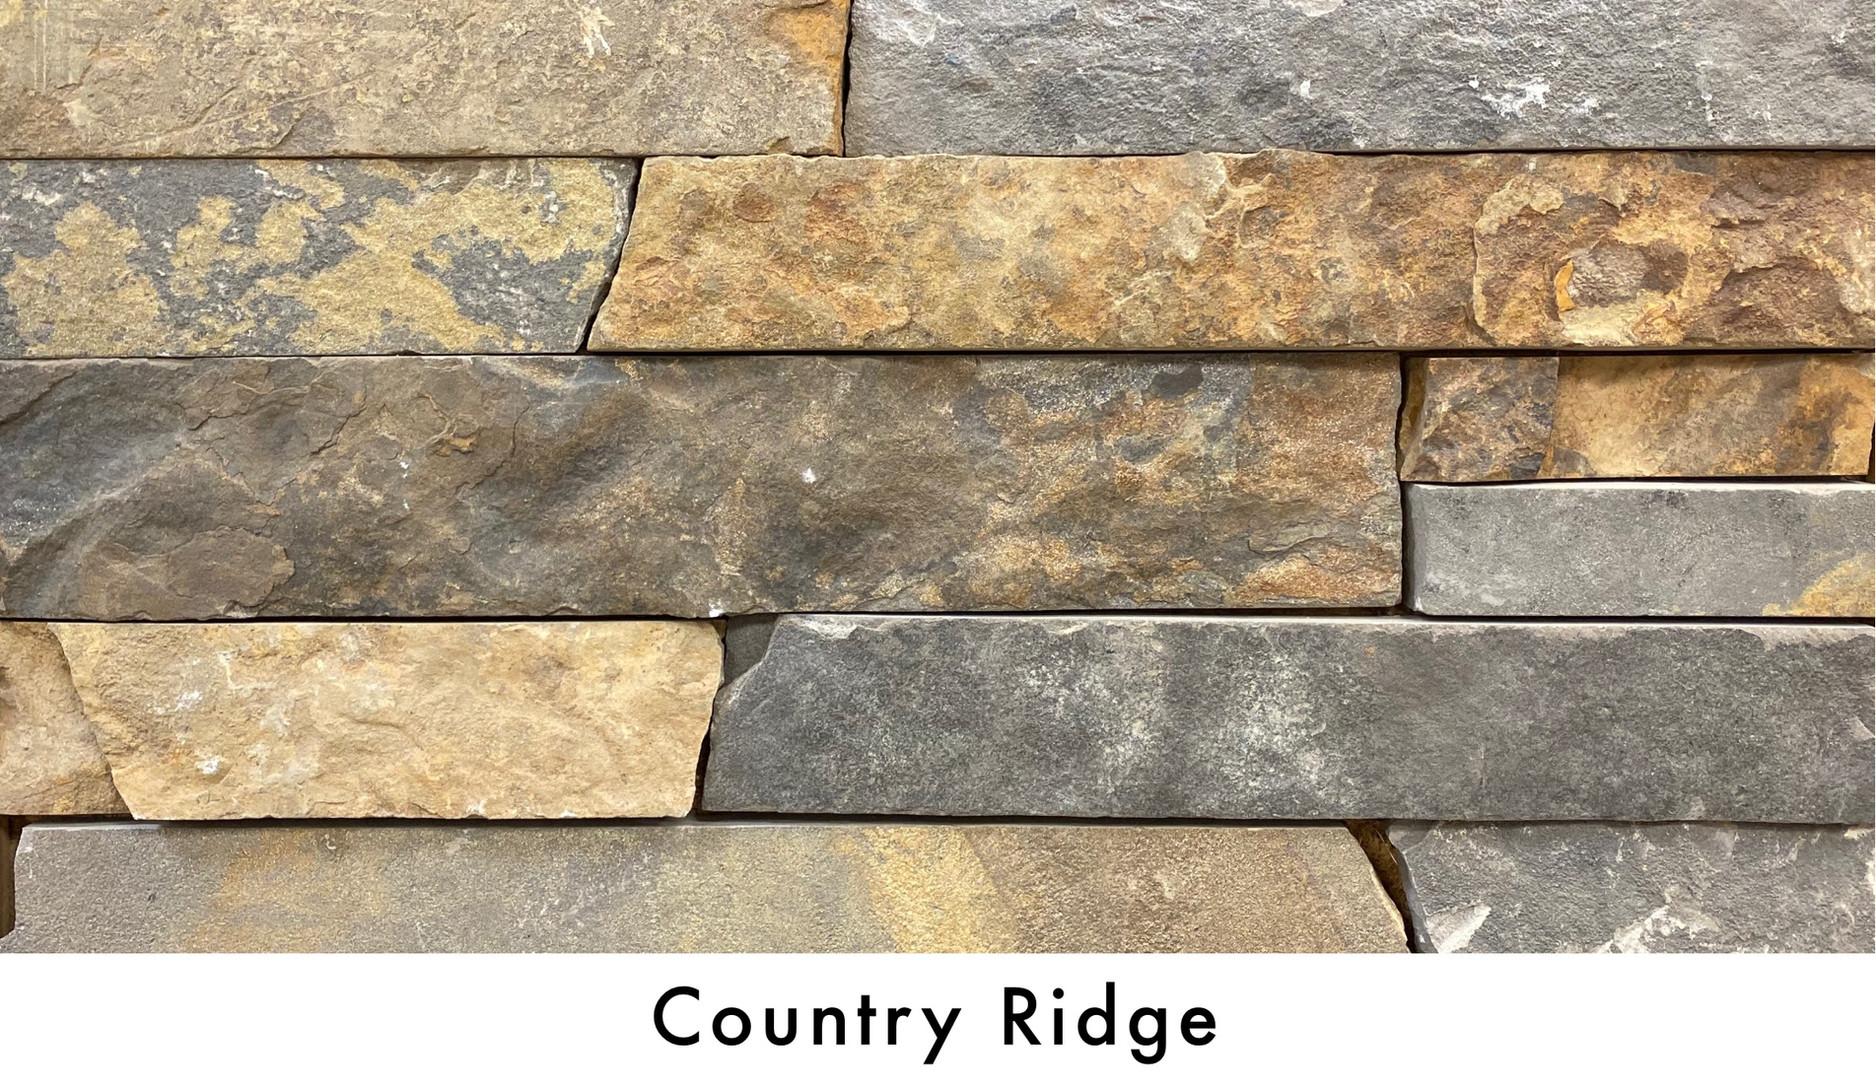 Country Ridge